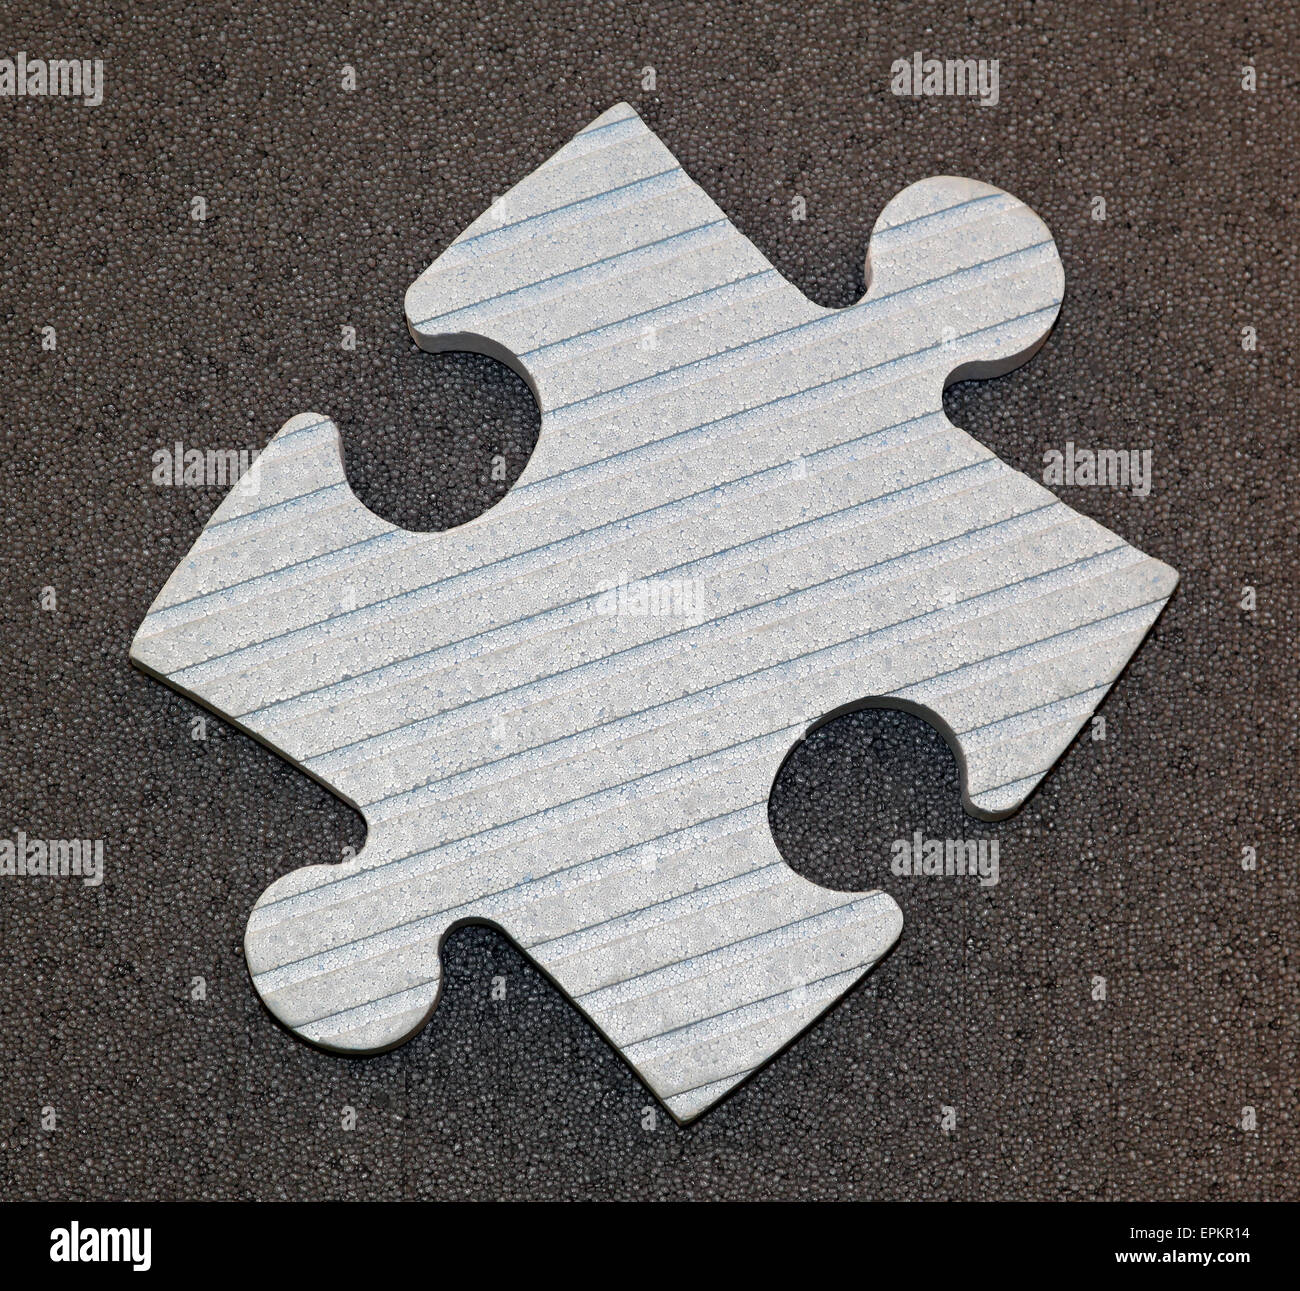 Puzzle piece - Stock Image